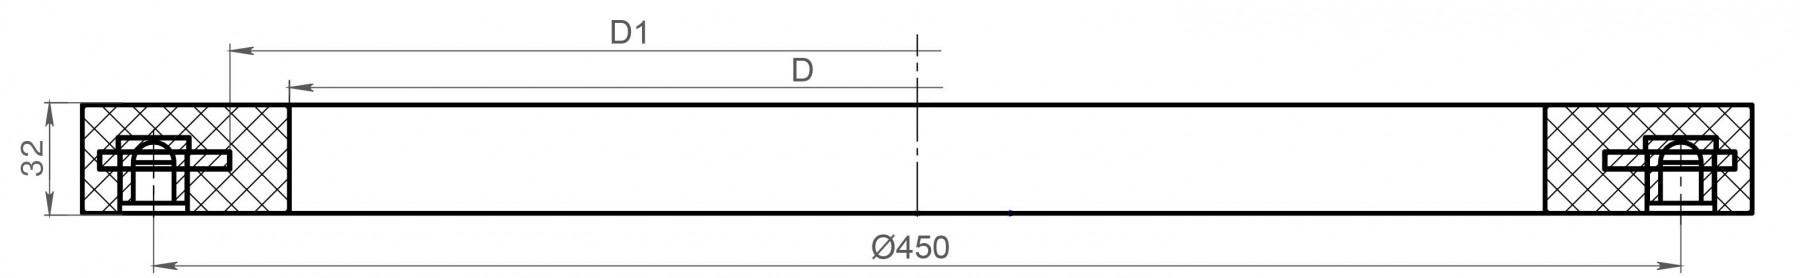 mm286864345